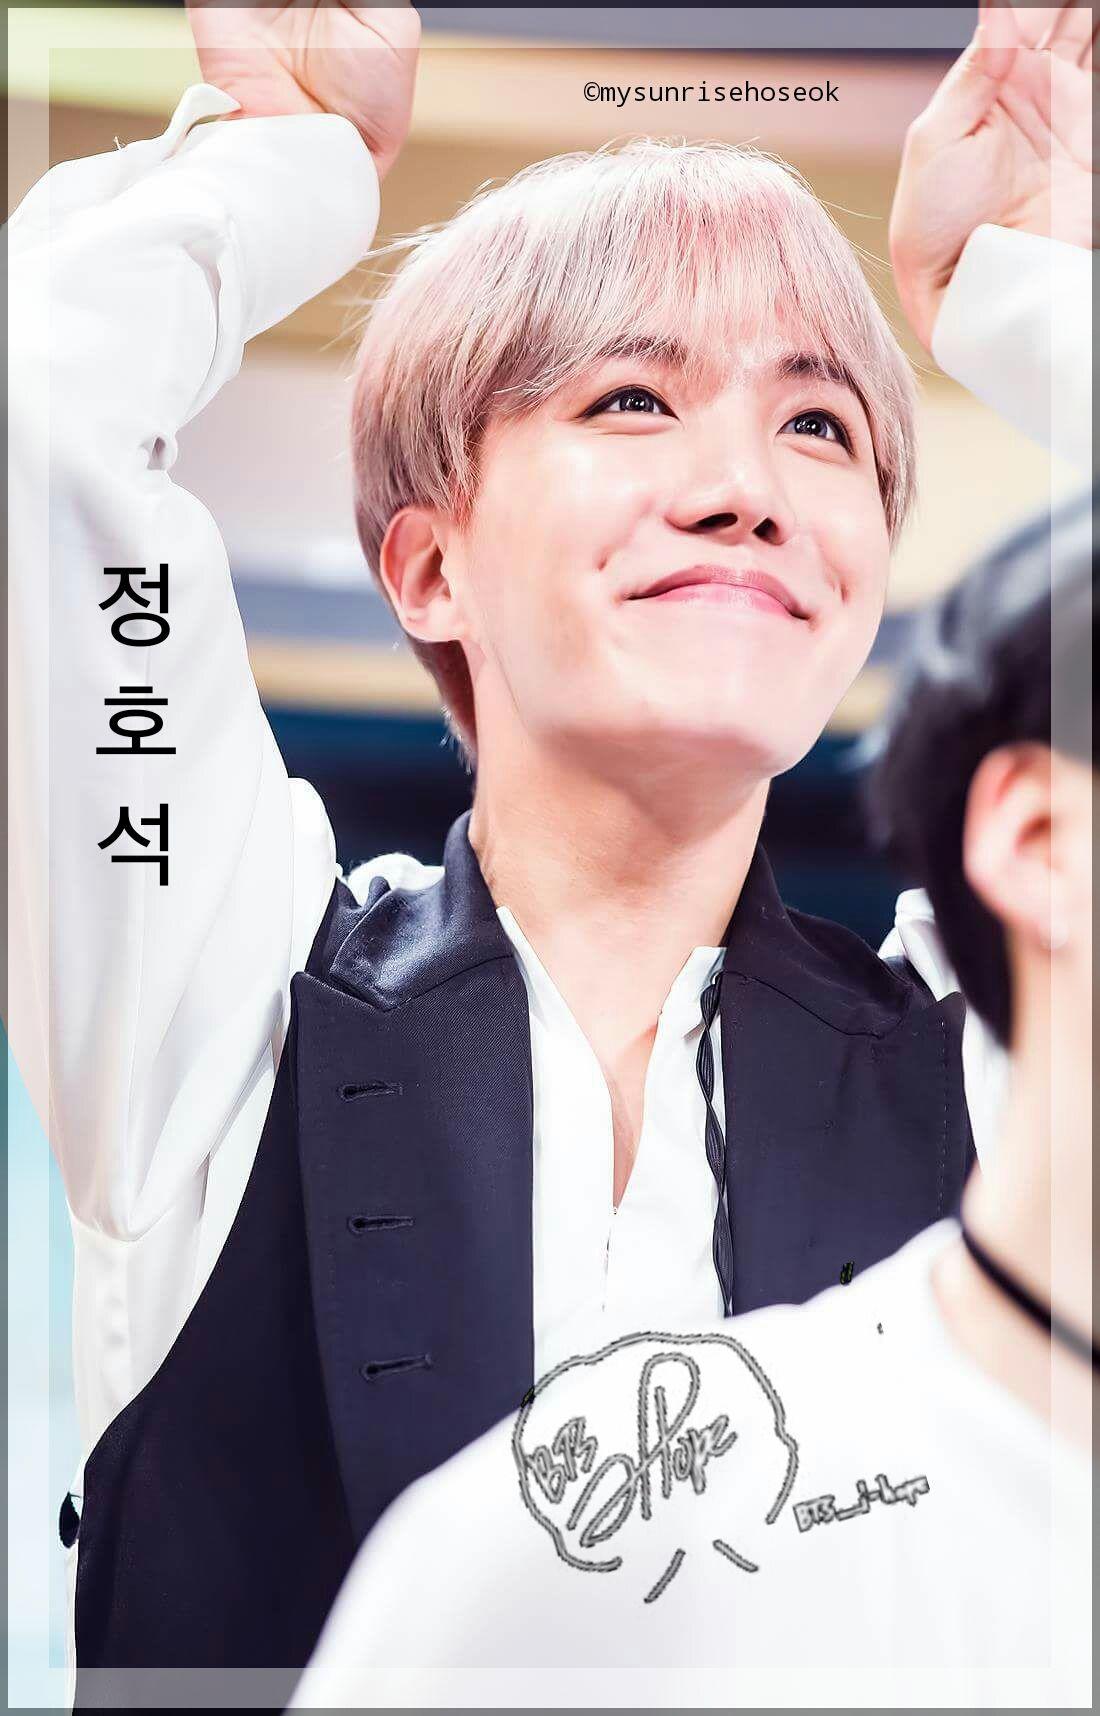 Free Download Bts J Hope Wallpaper Mysunrisehoseok Bts